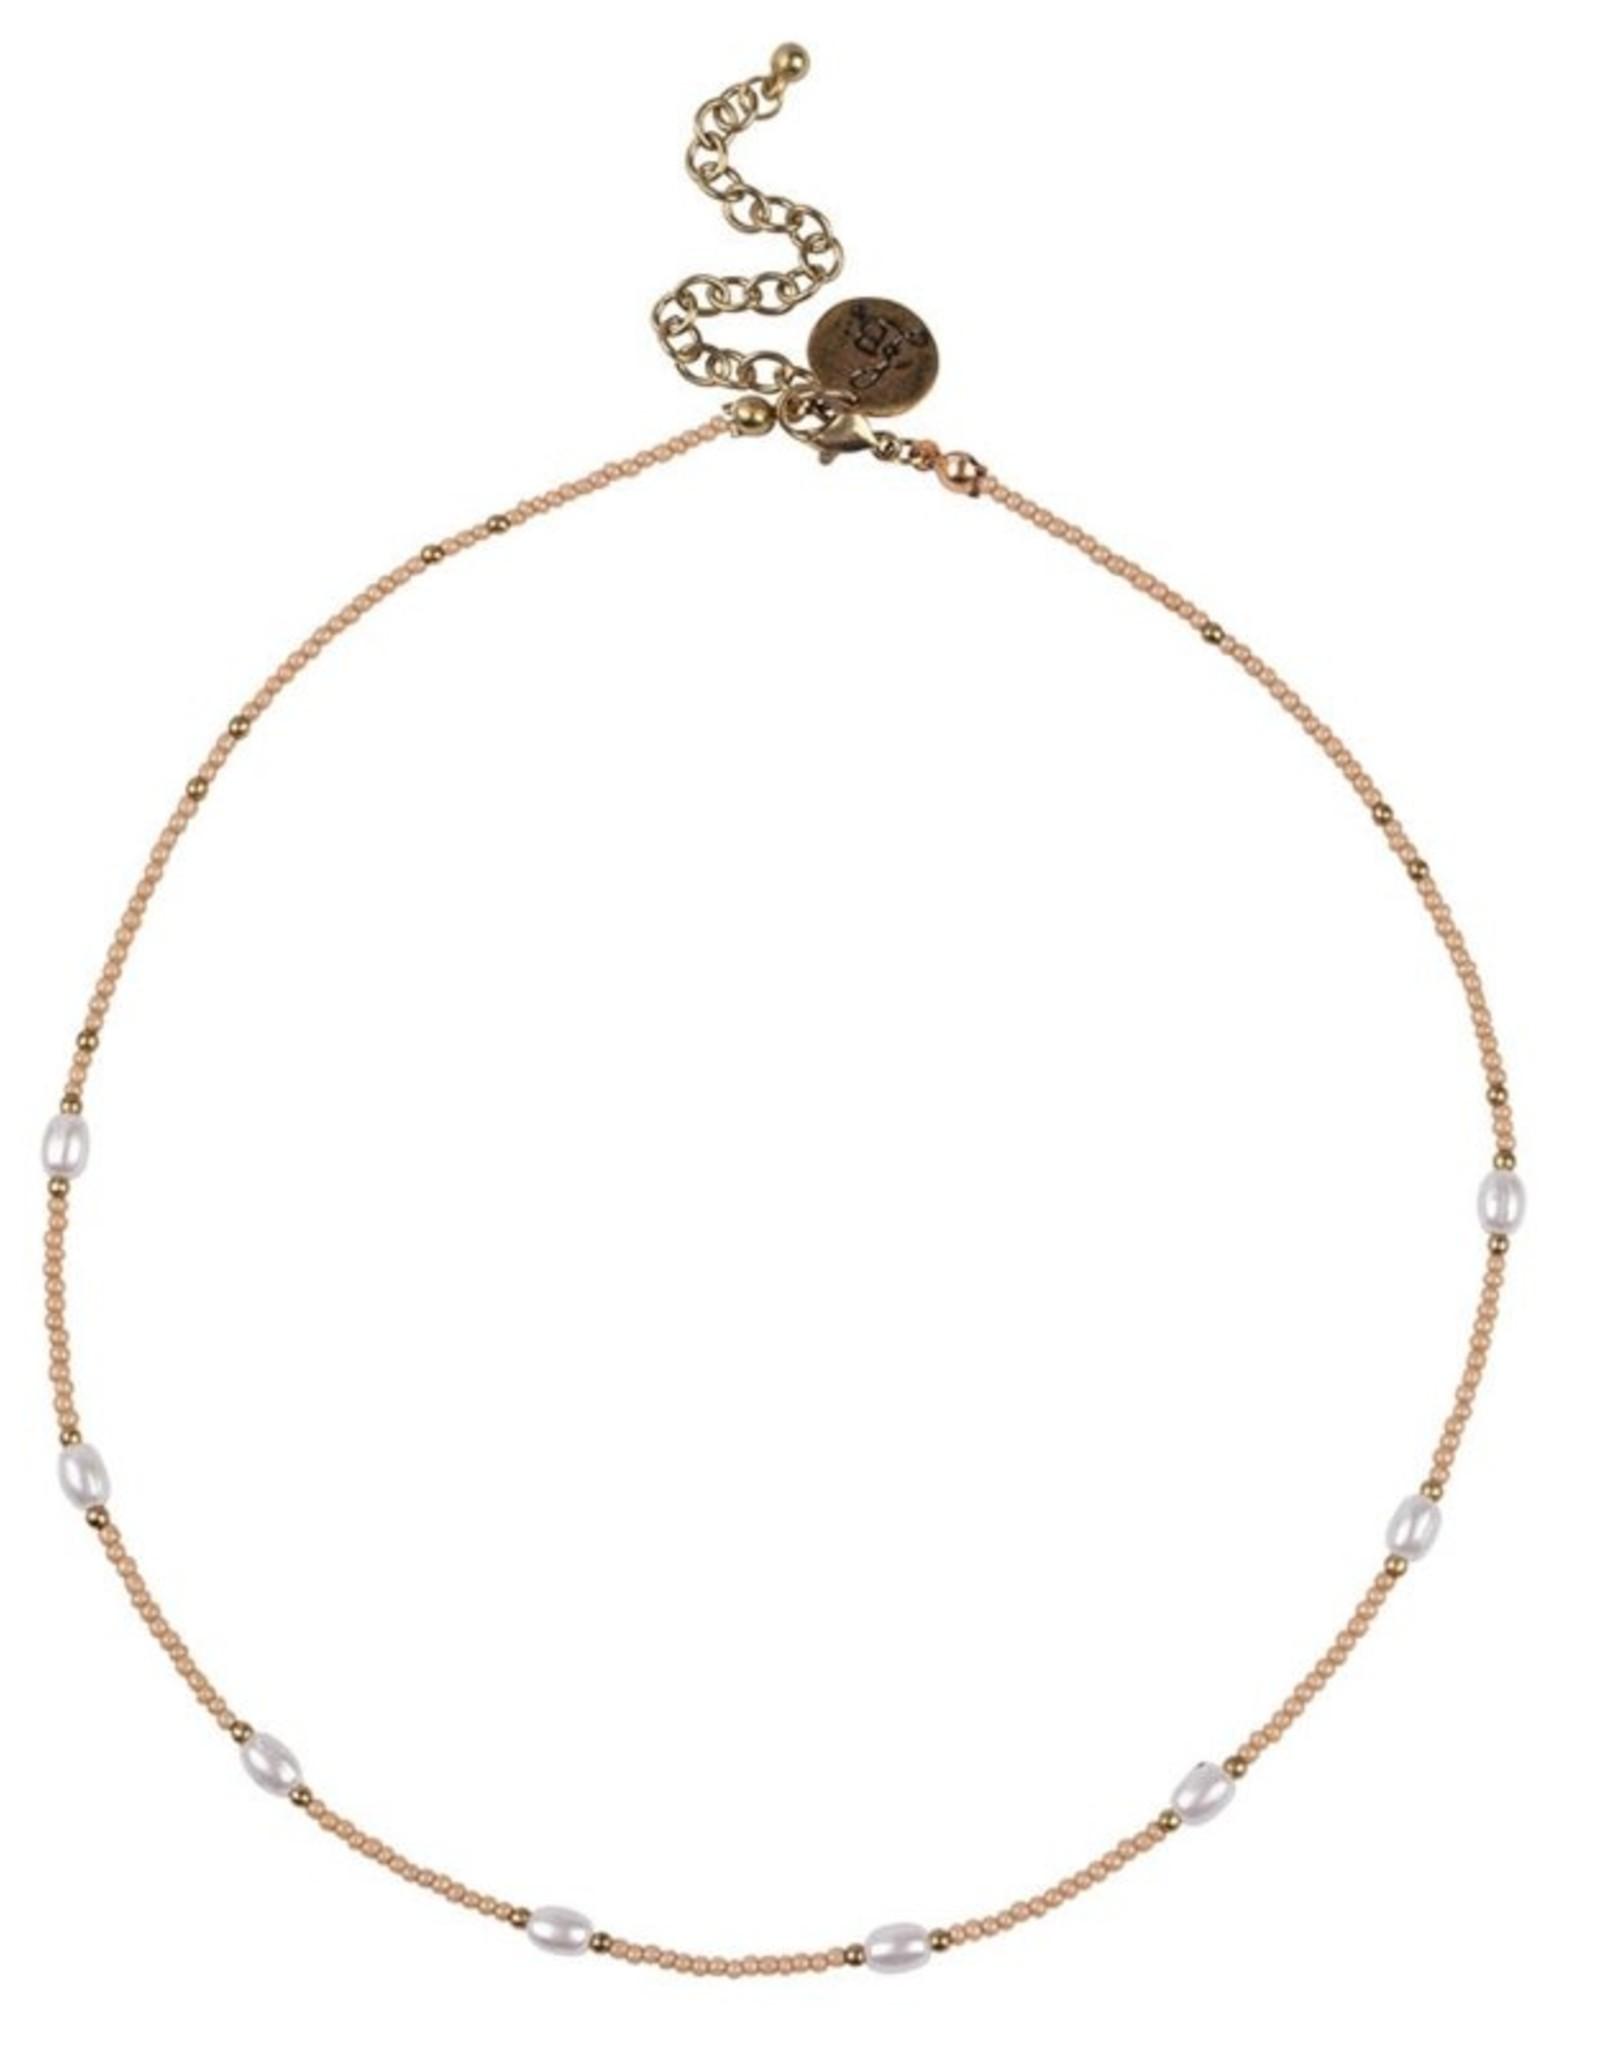 Bulu Bulu Happy Beads Necklace pearl pink